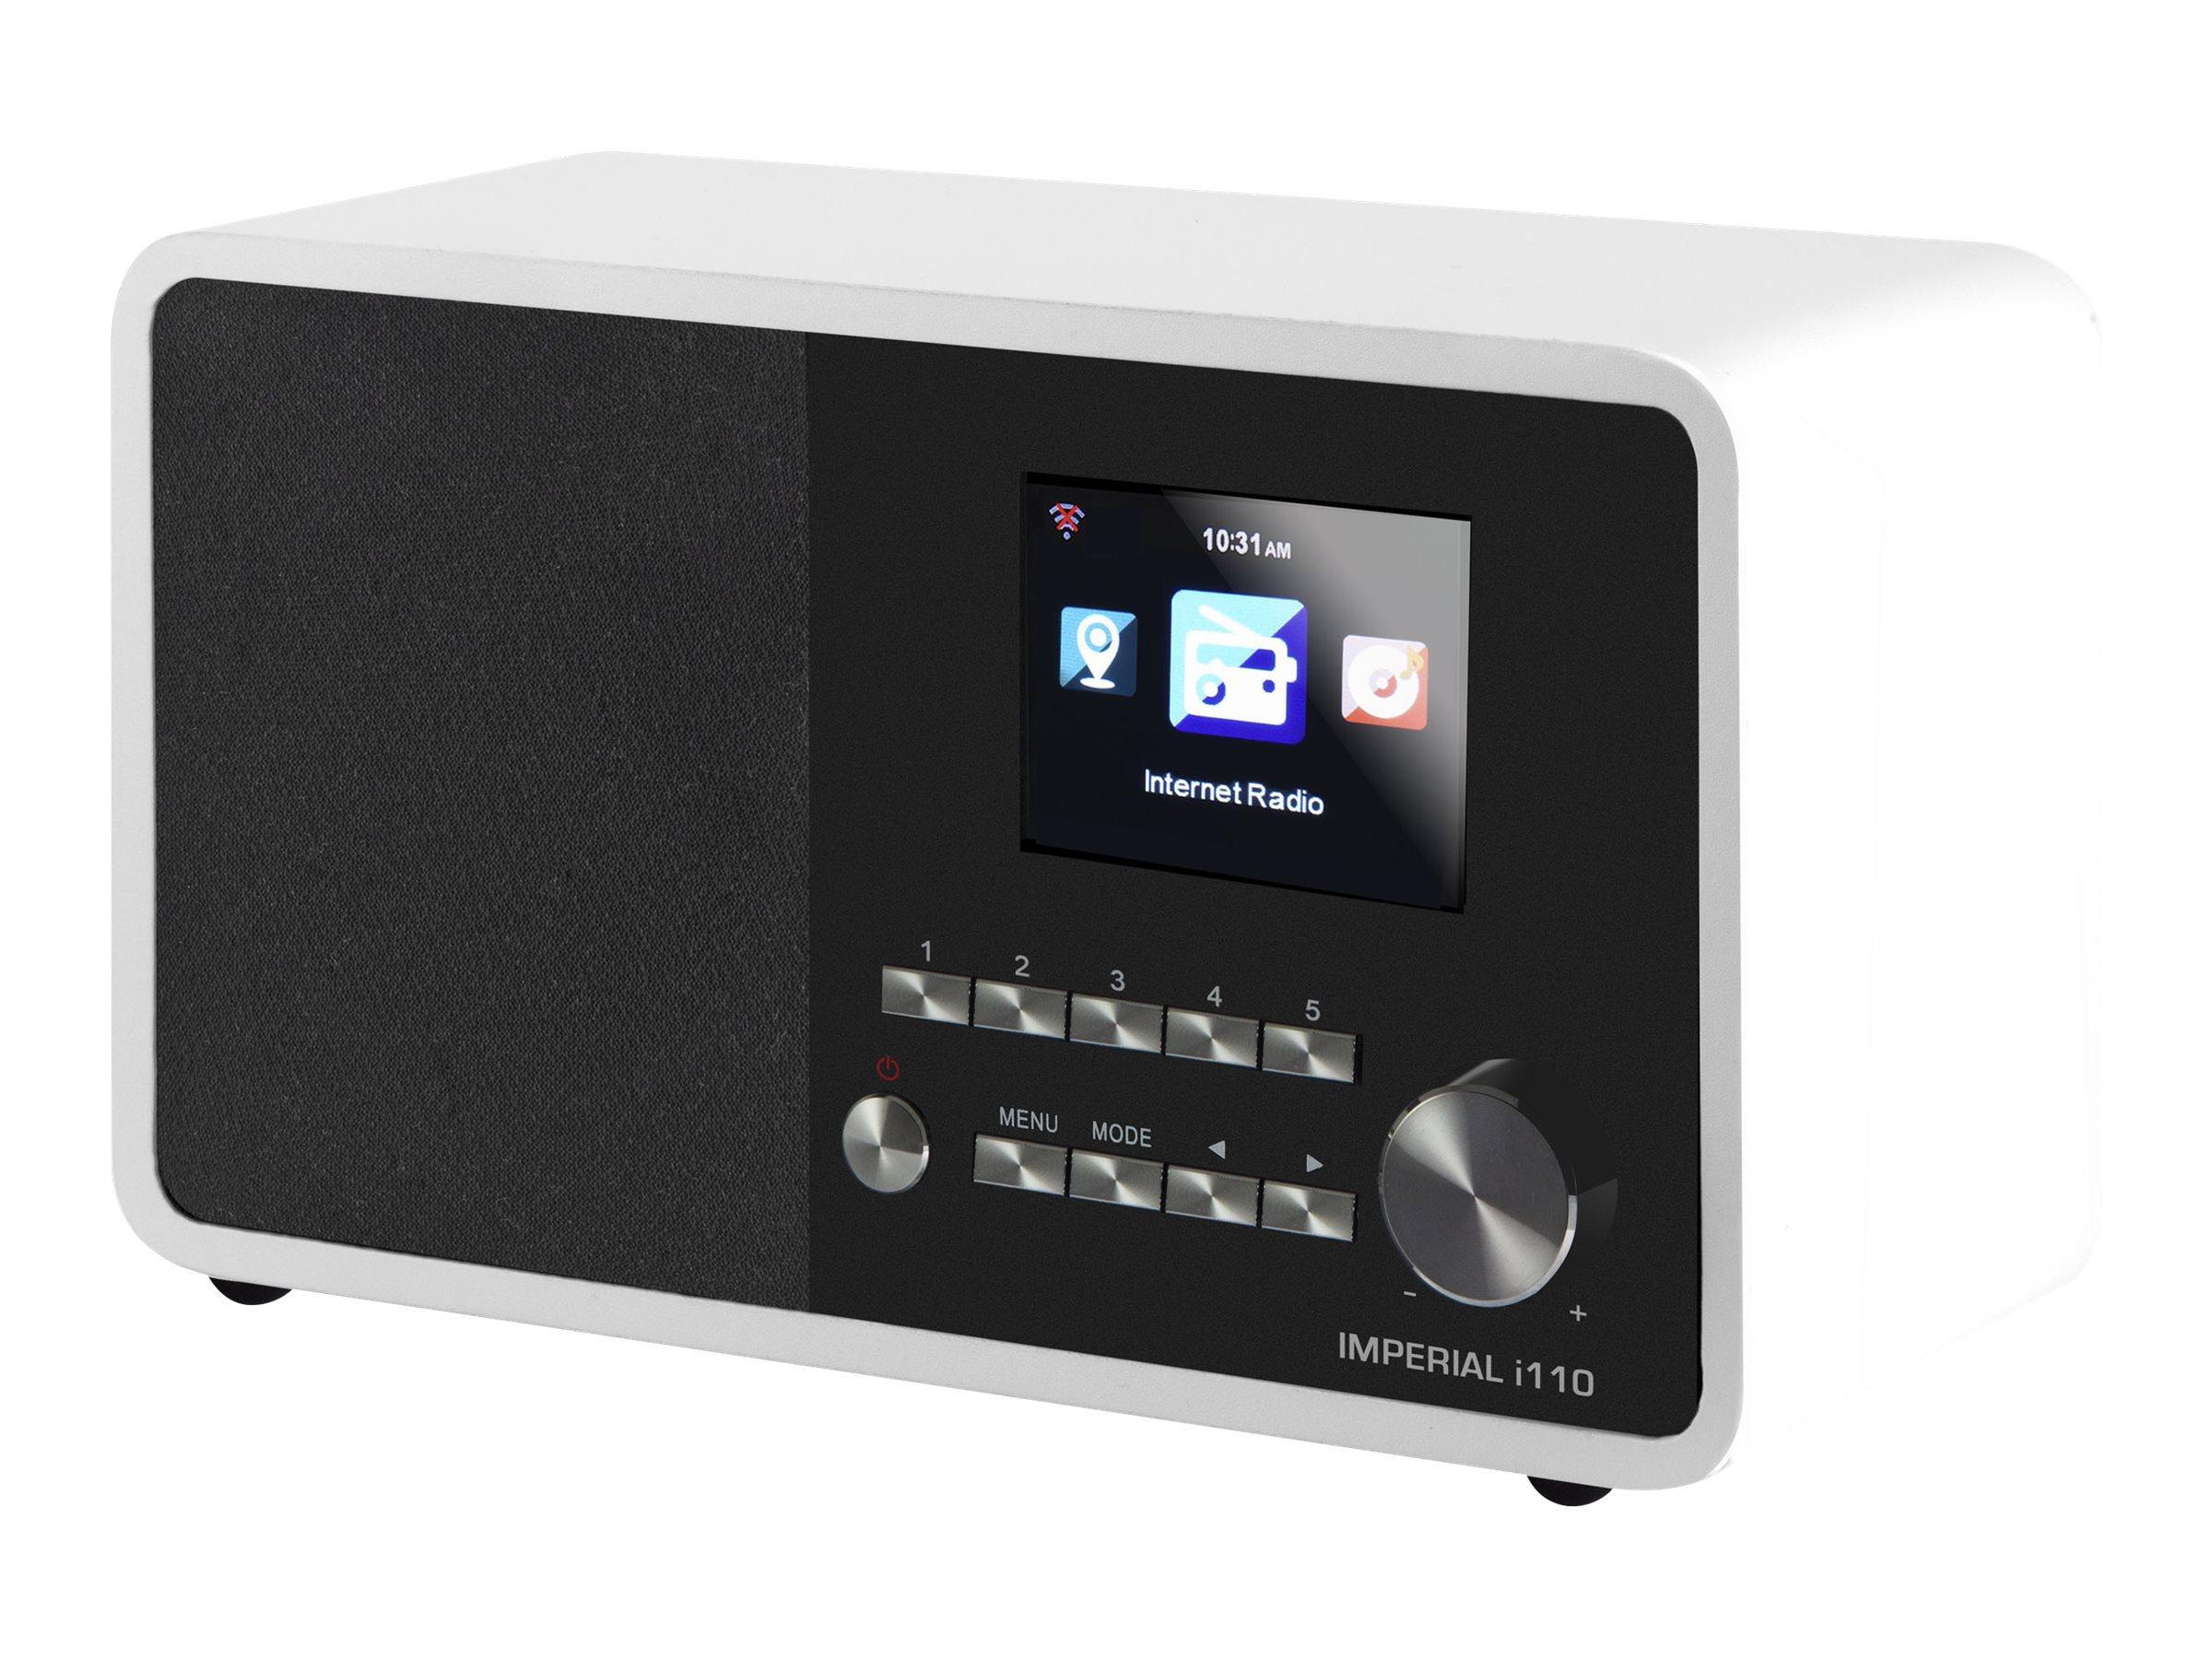 Telestar imperial i110 - Netzwerk-Audio-Player - 5 Watt (Gesamt)